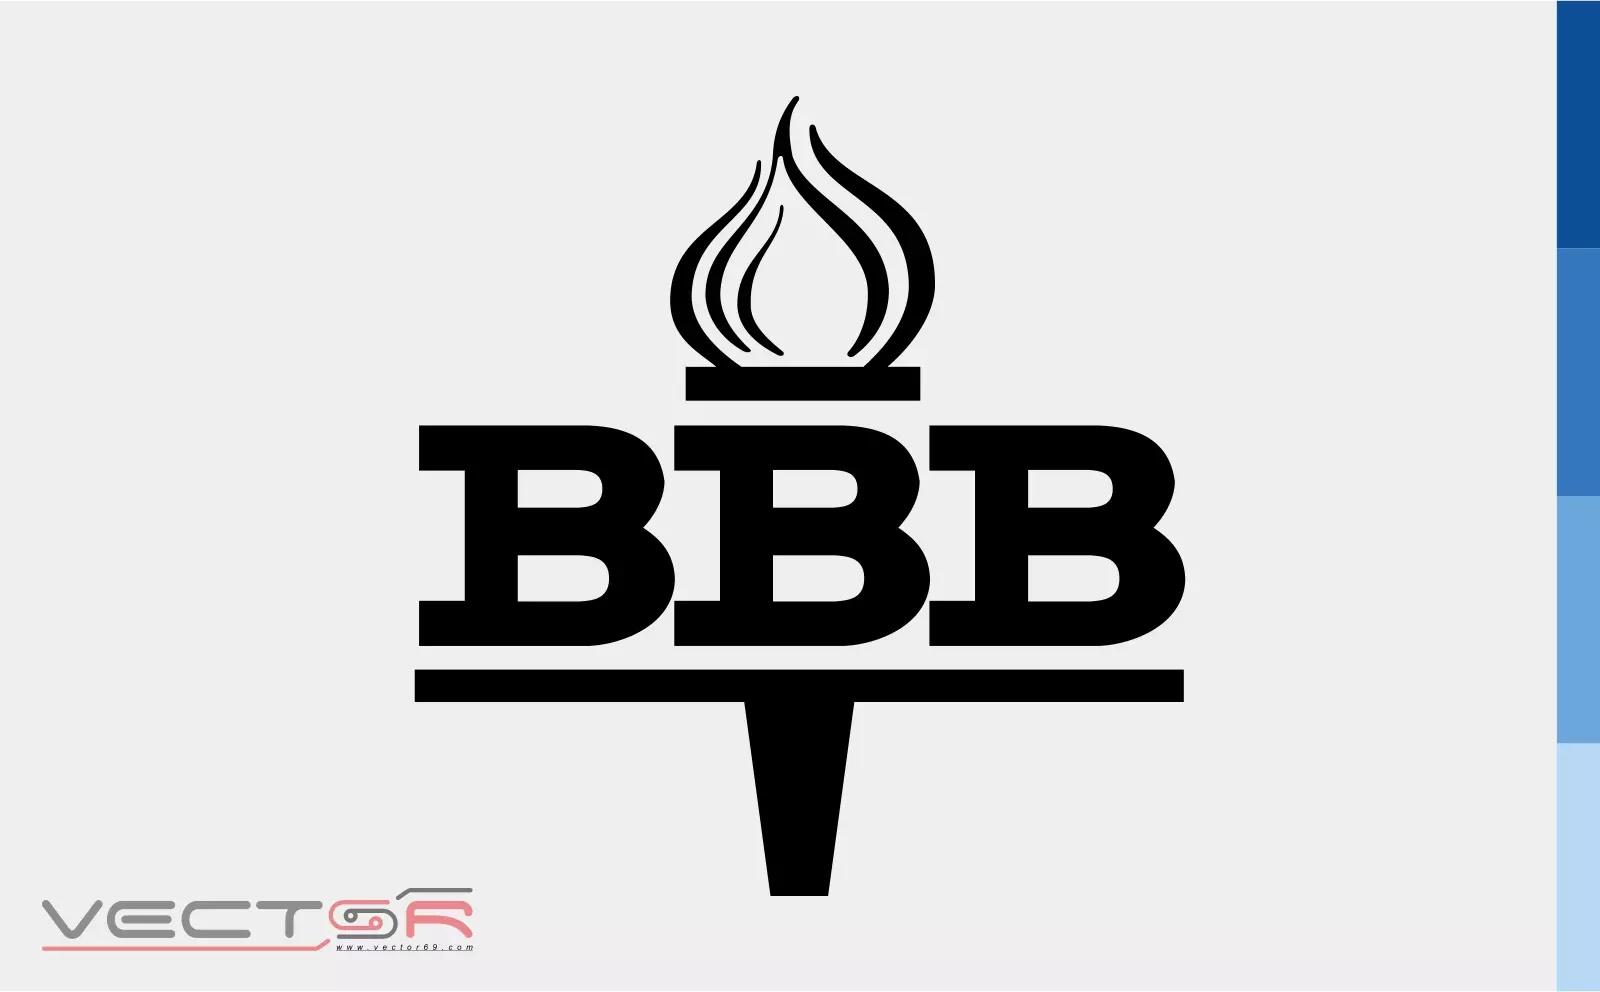 BBB - Better Business Bureau (1965) Logo - Download Vector File Encapsulated PostScript (.EPS)